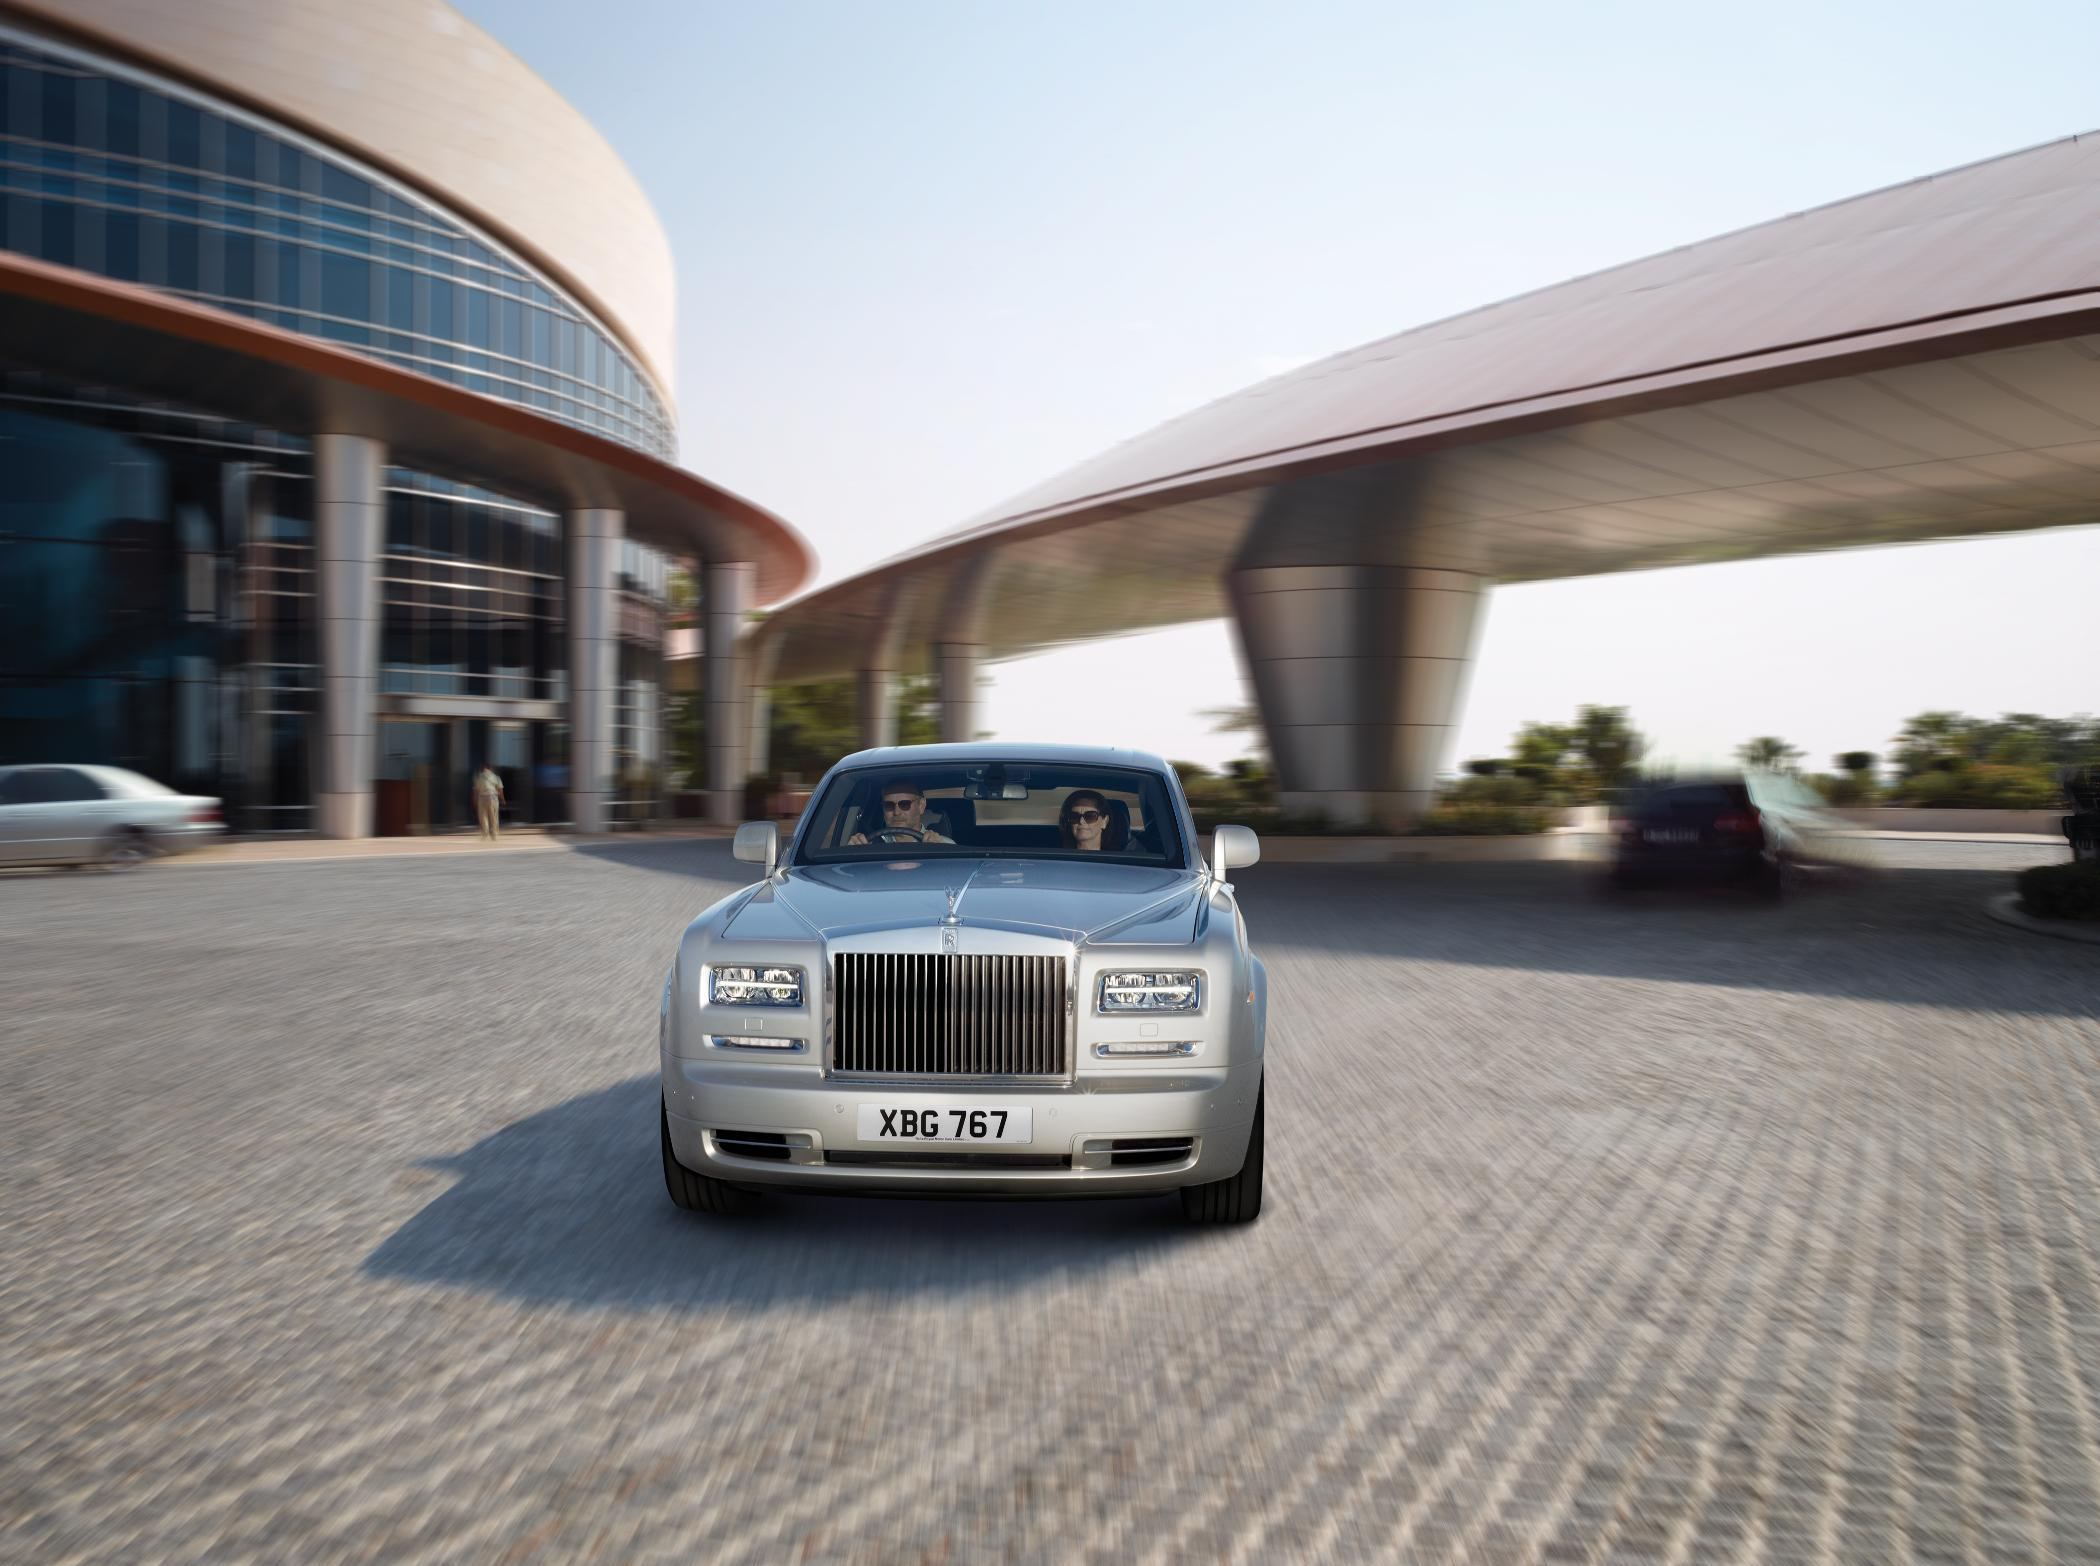 Rolls Royce Phantom II Driving